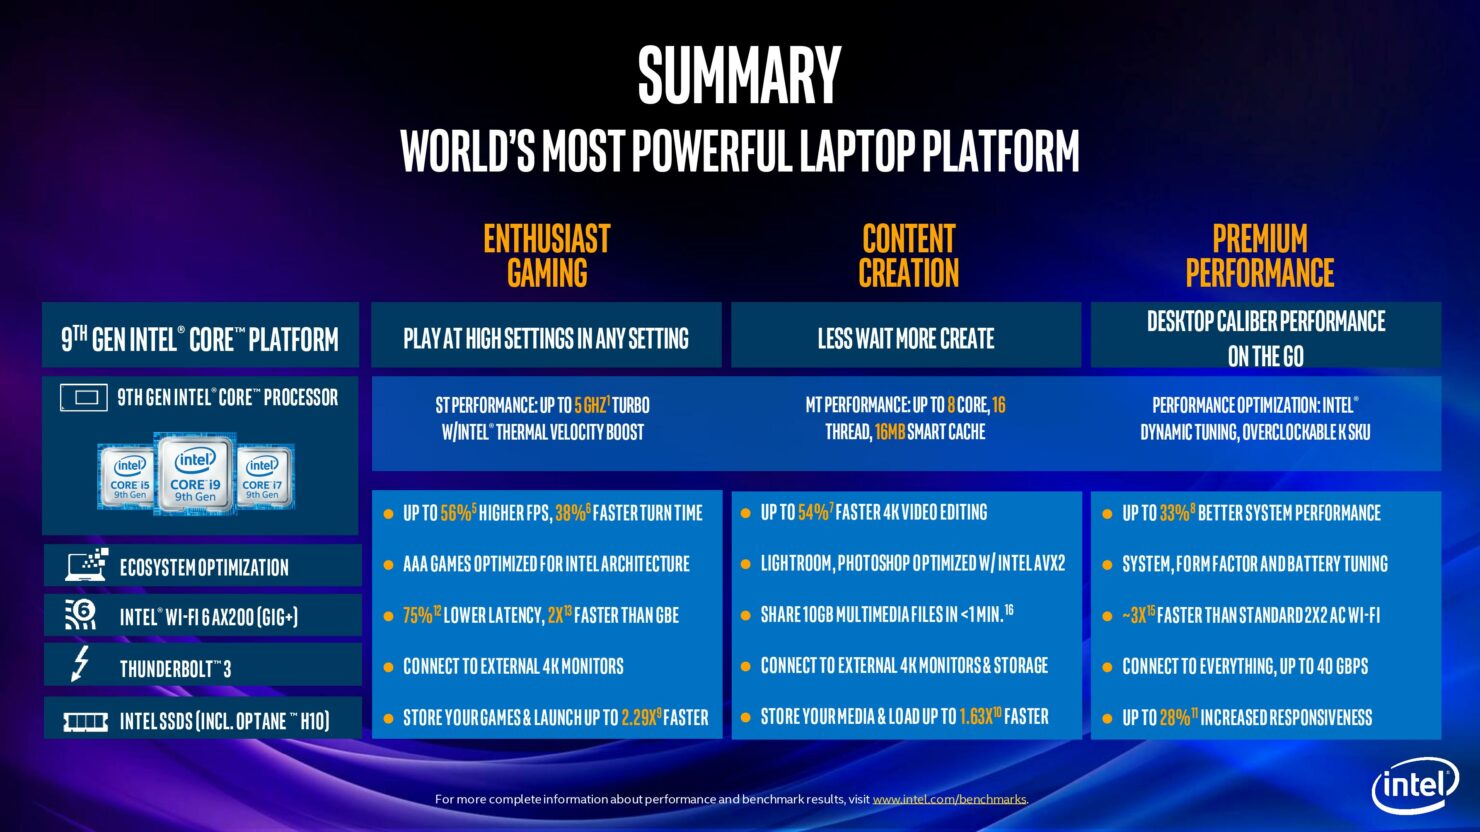 9th-gen-intel-core-mobile-launch-presentation-under-nda-until-april-23-page-017